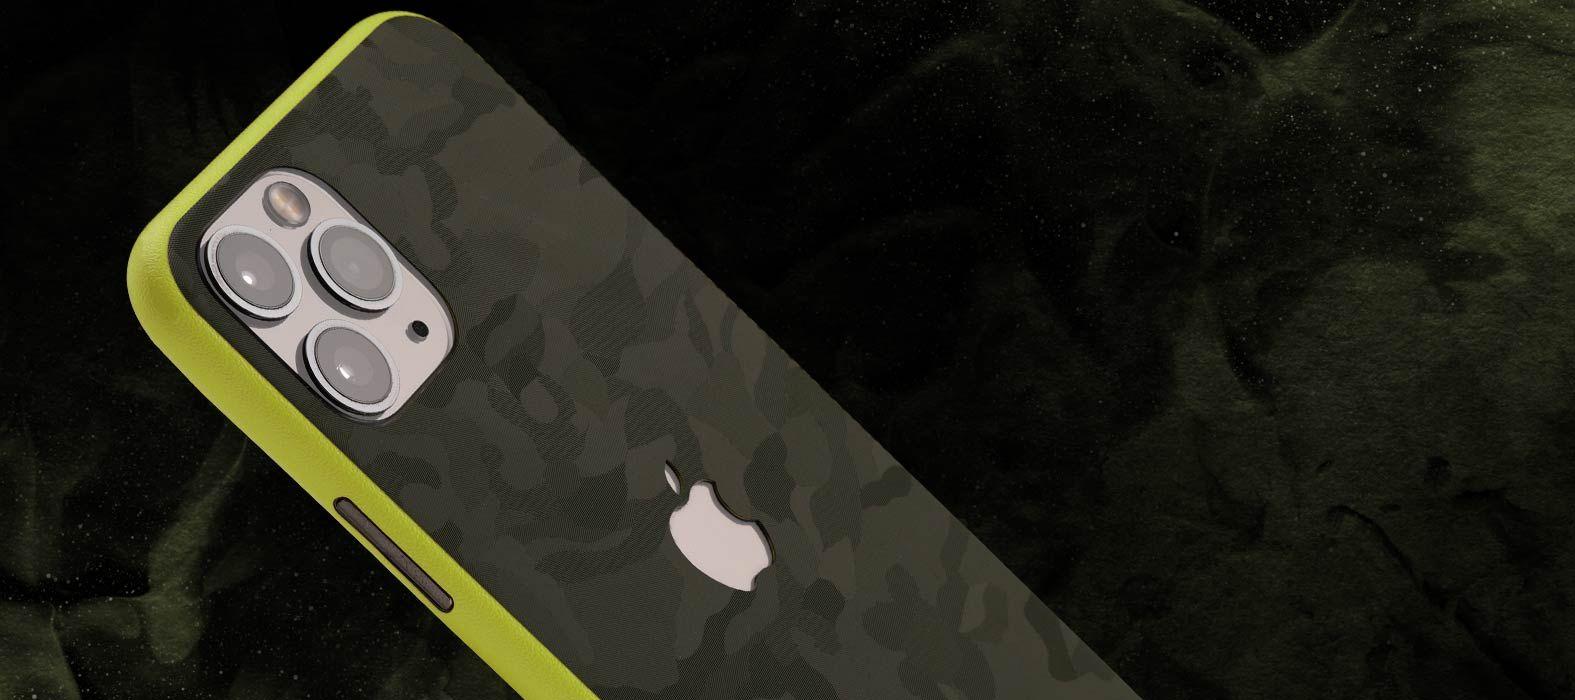 iPhone 11 Pro Sawfly Skins